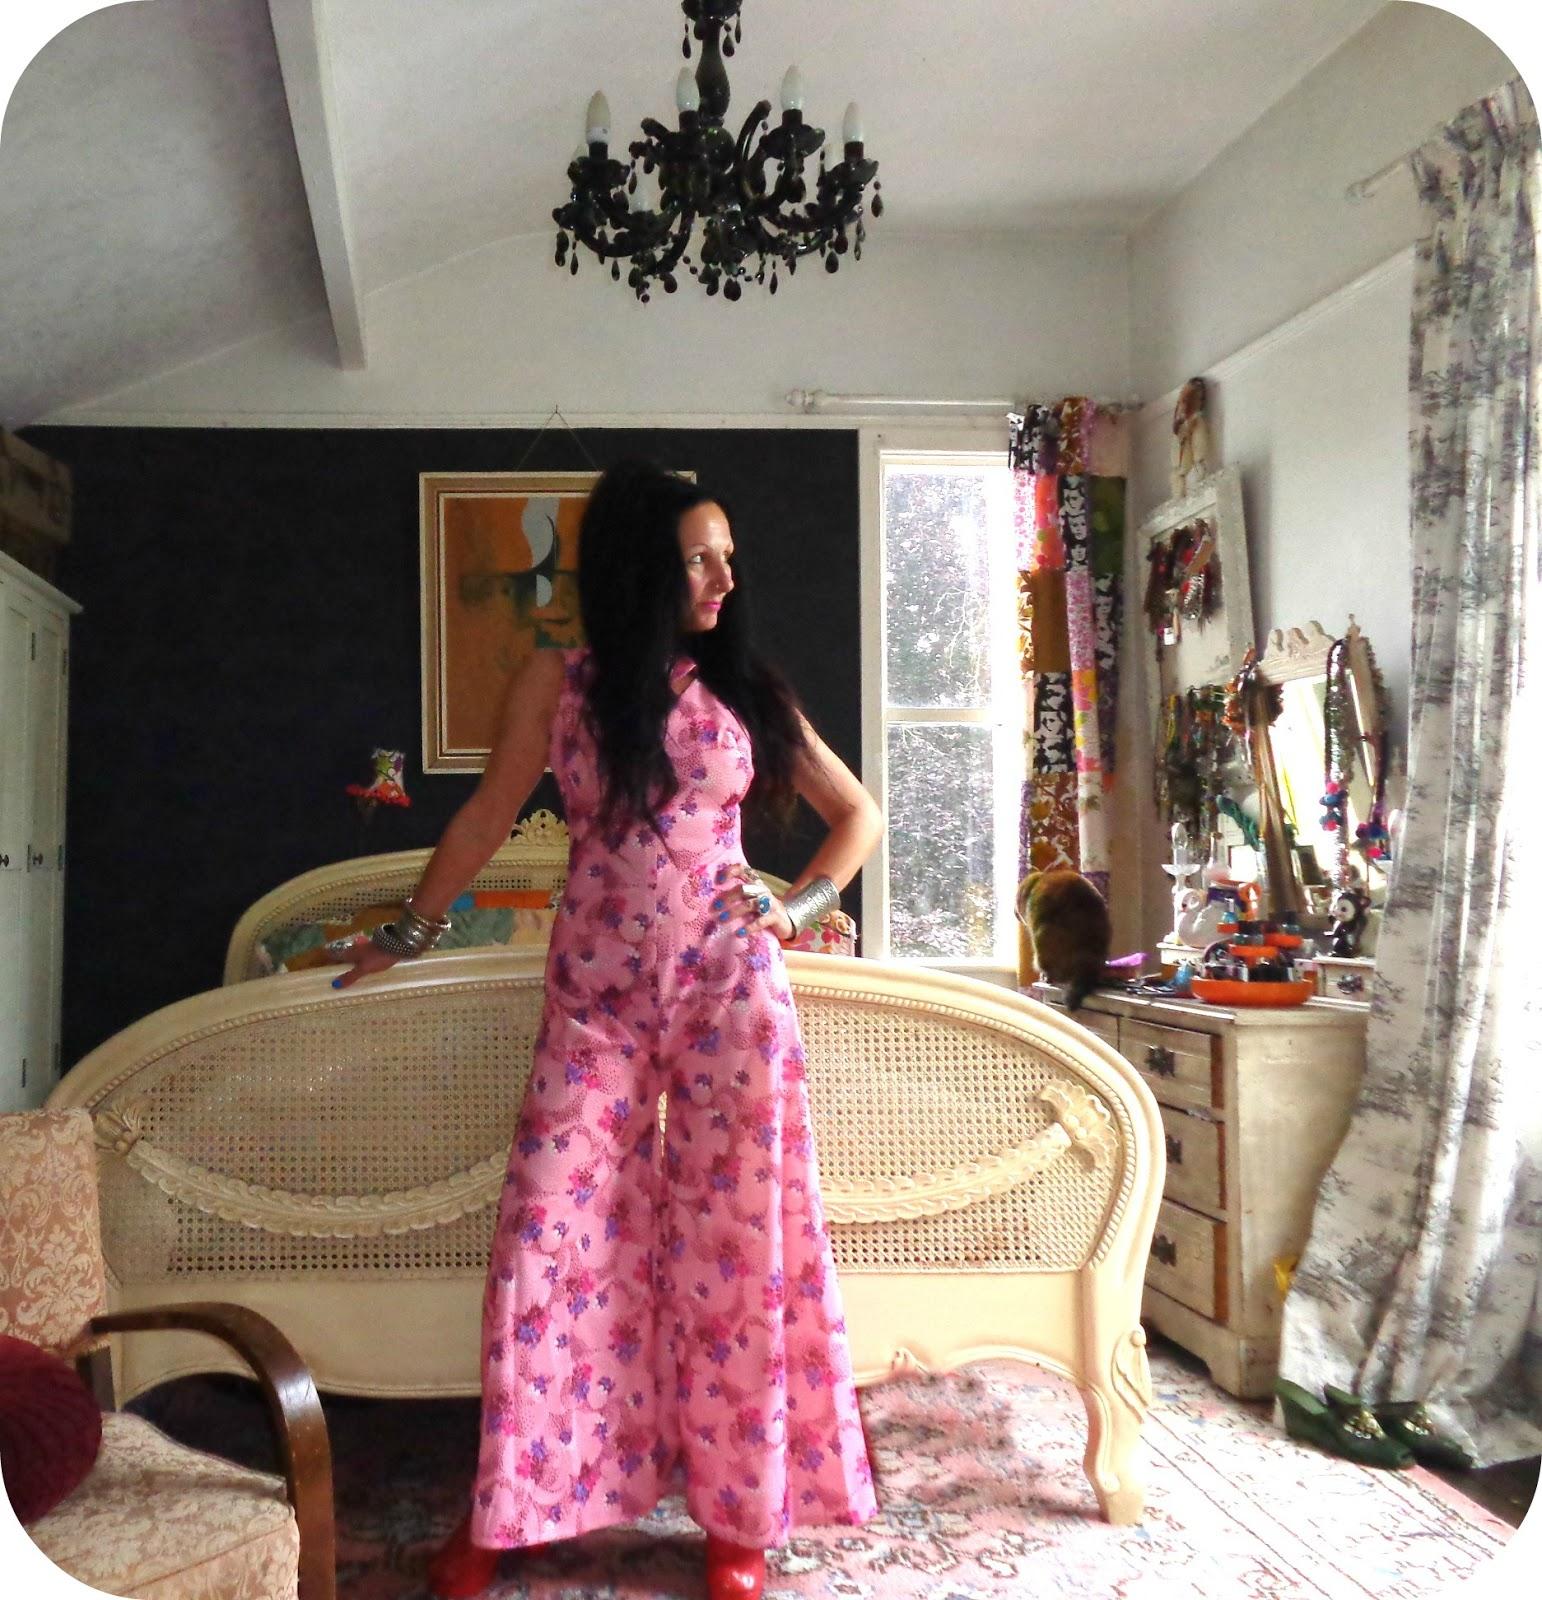 Vintage Vixen: The Slovenly Seamstress